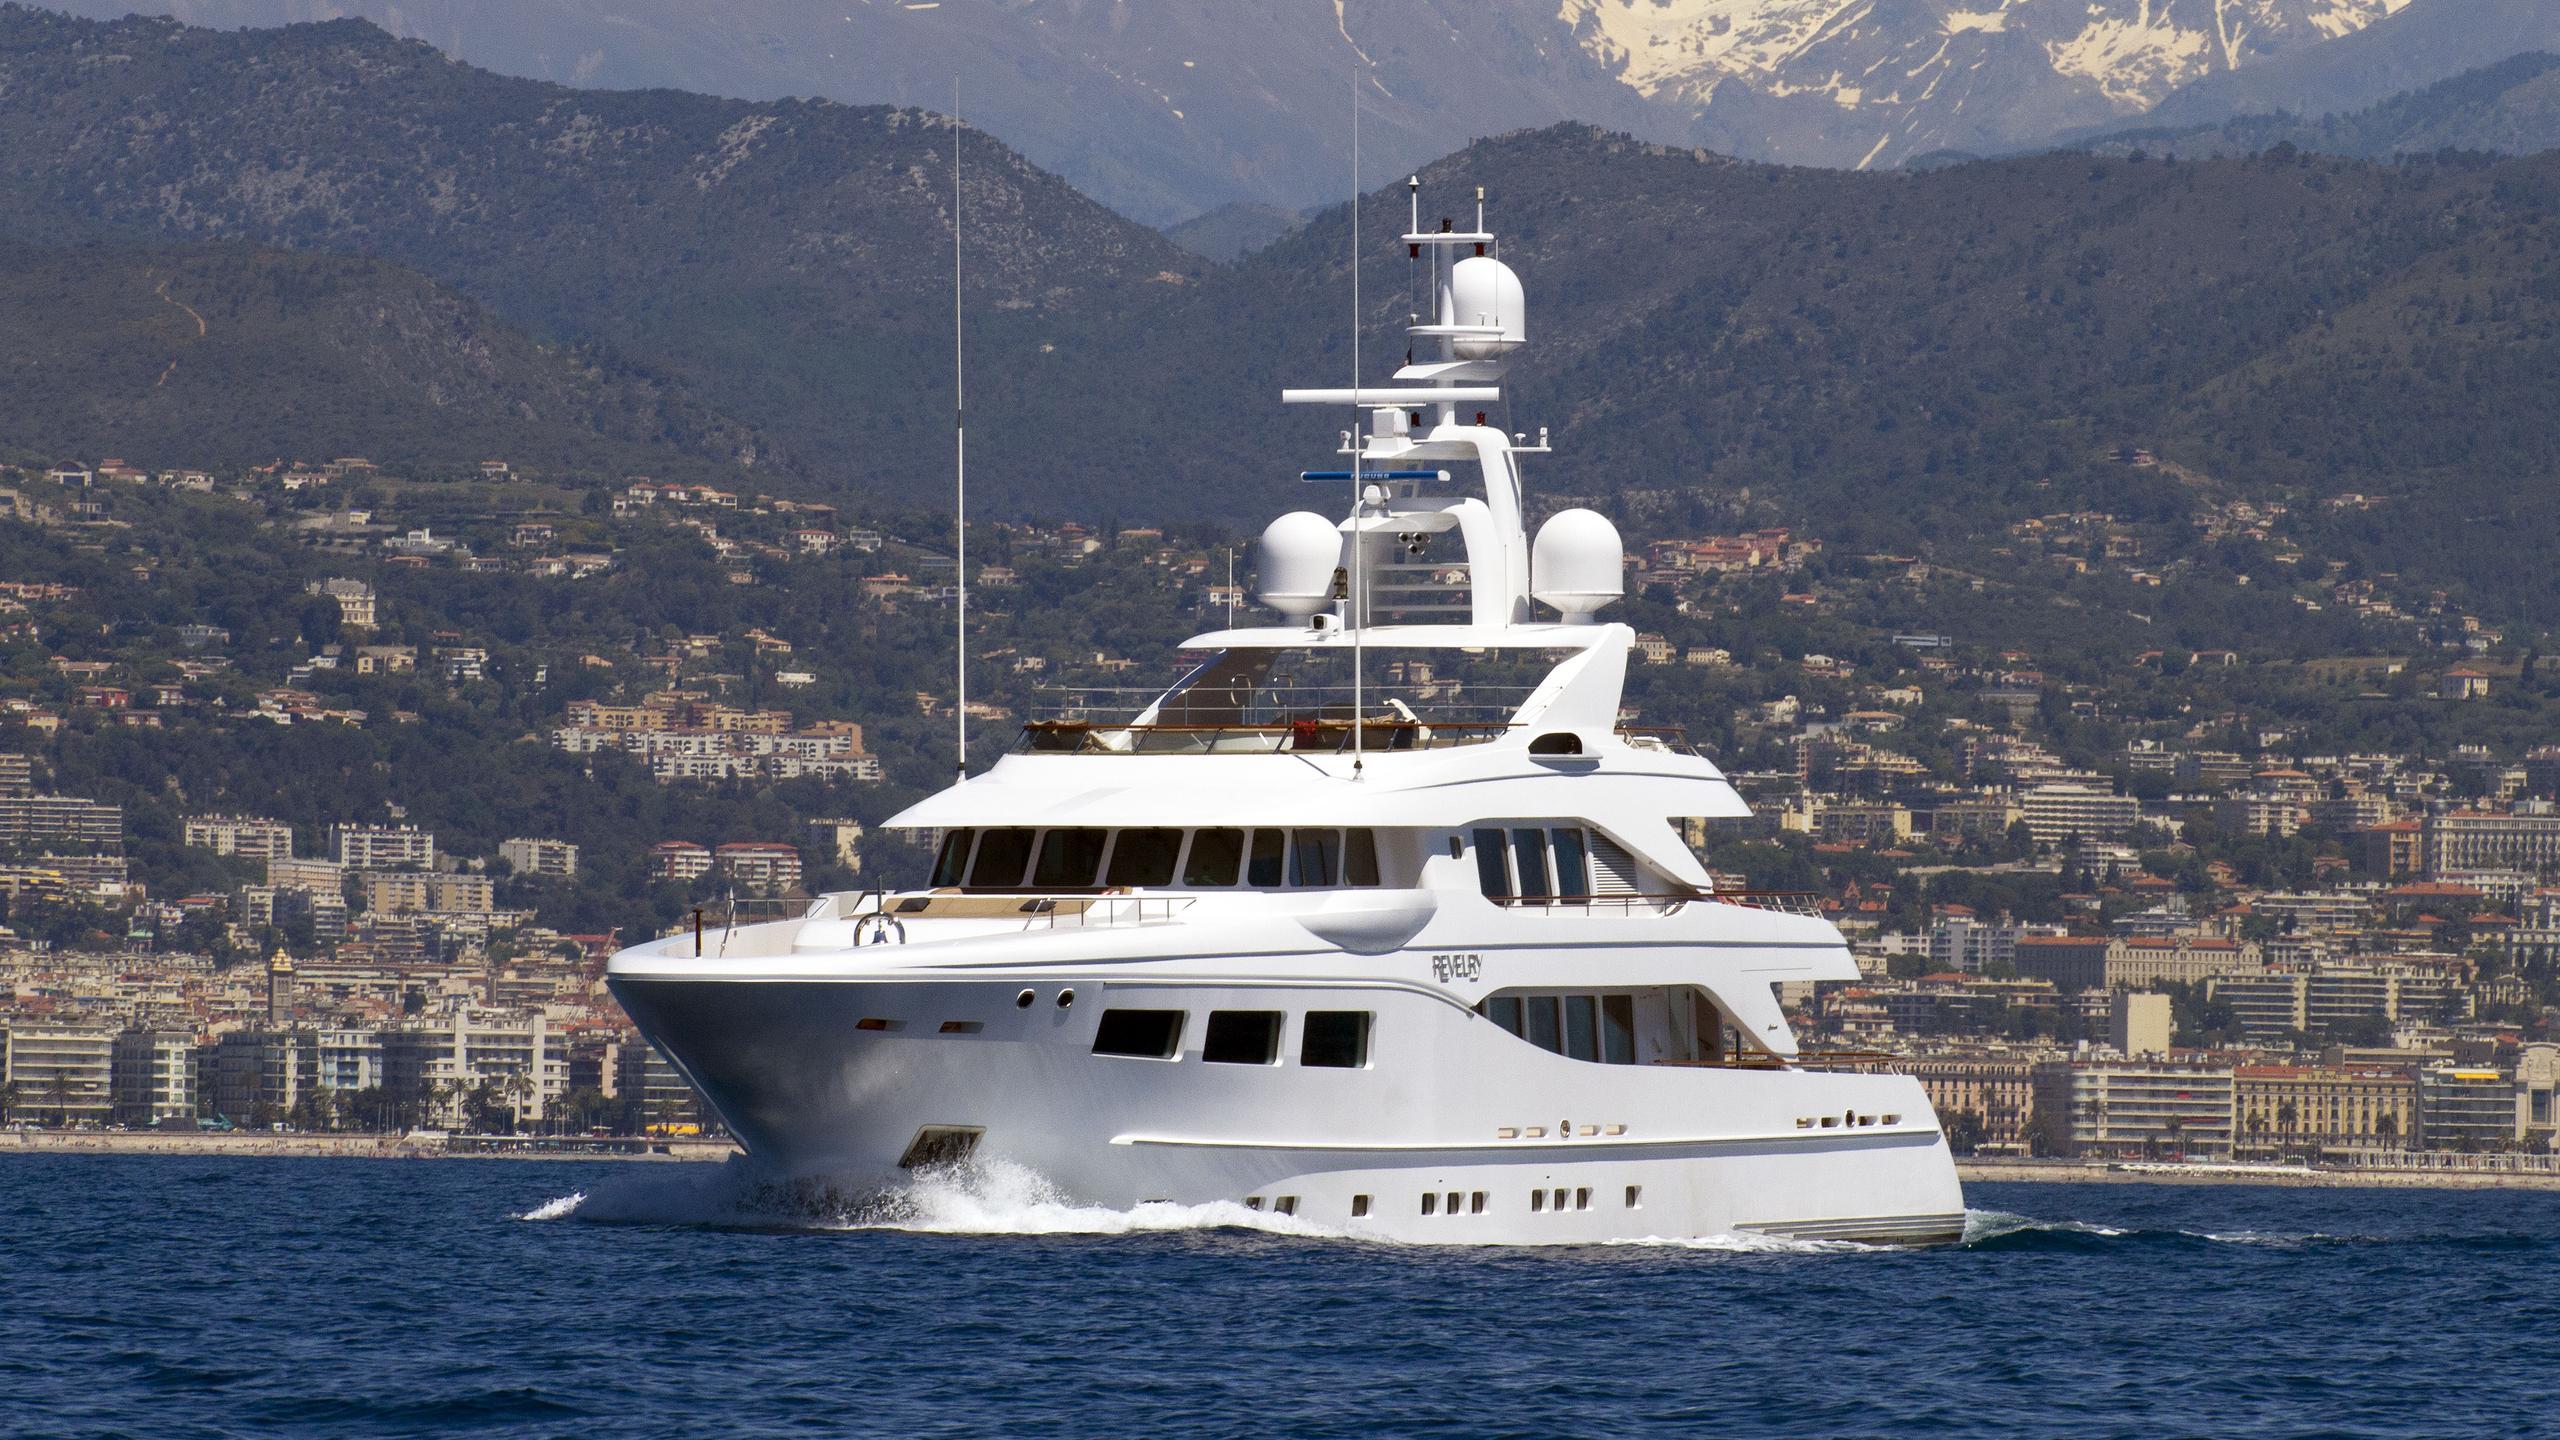 revelry-motor-yacht-hakvoort-2010-39m-half-profile